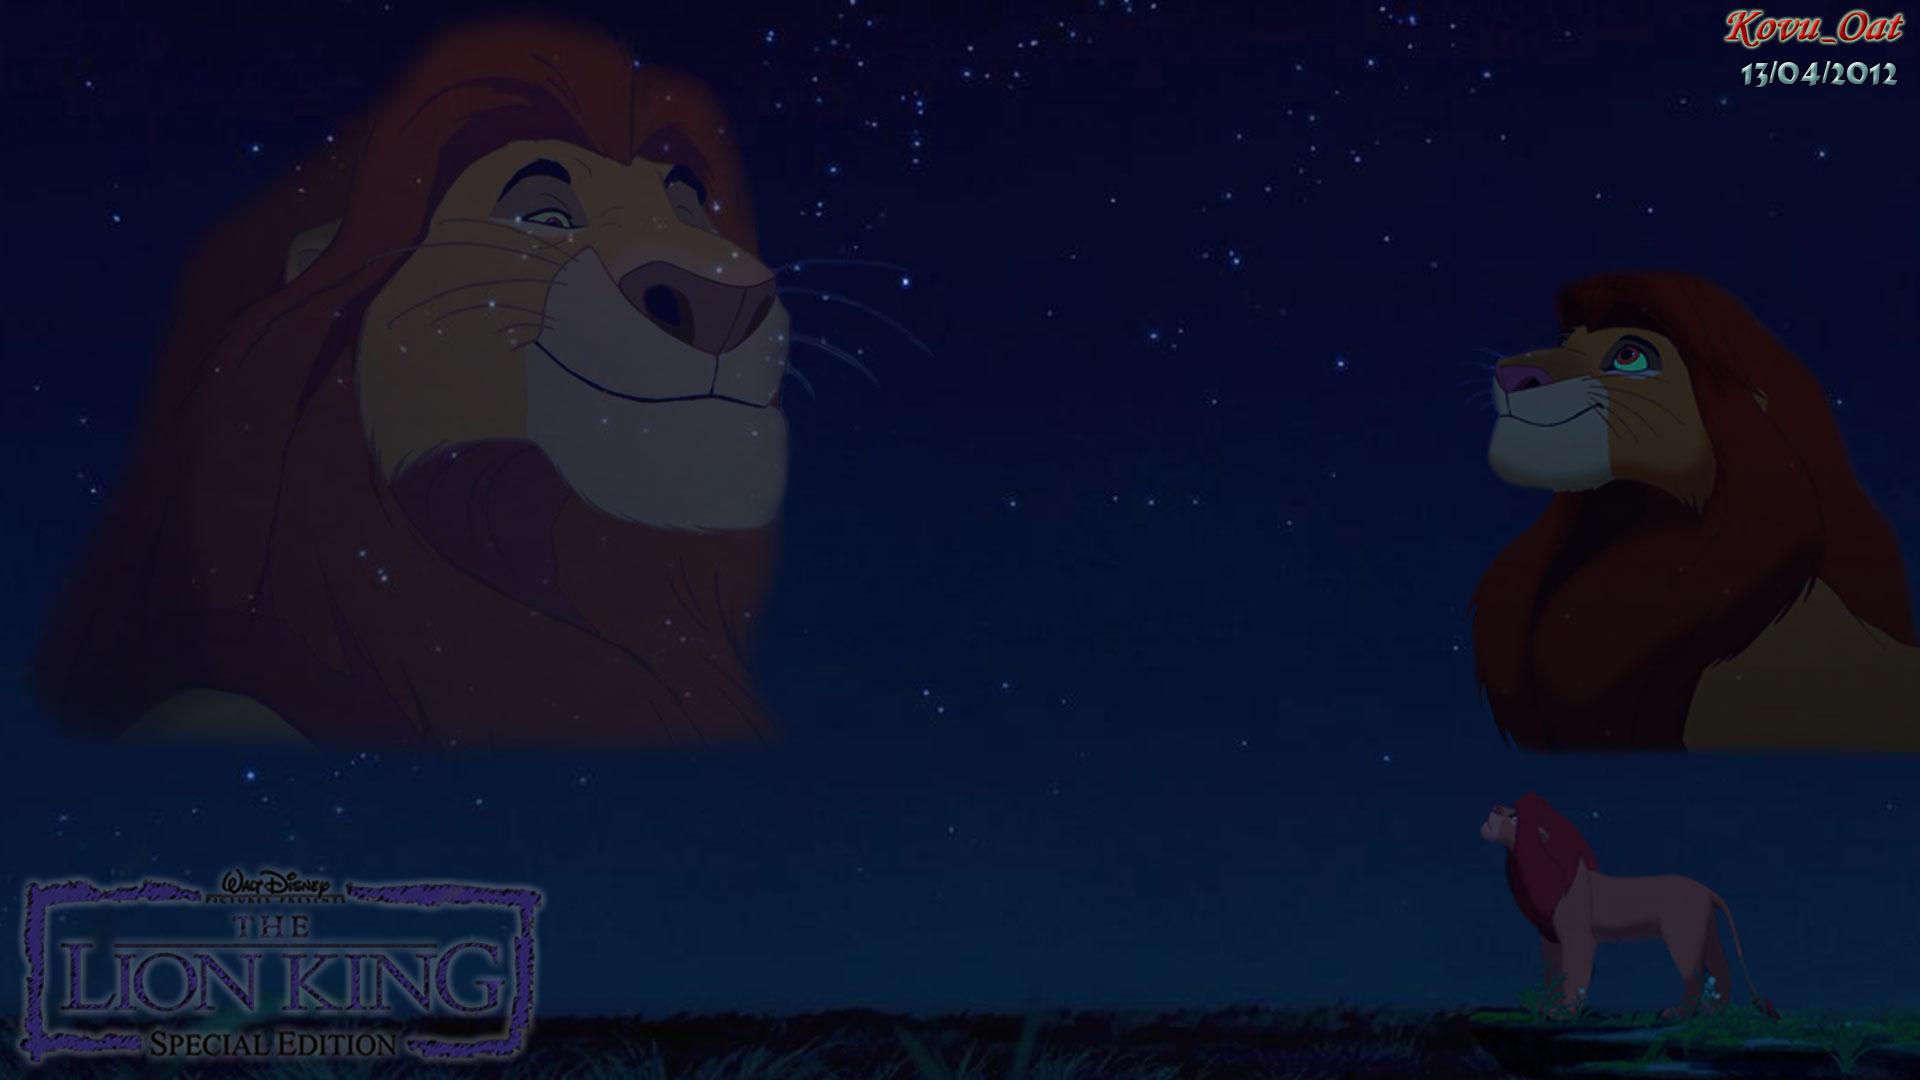 The Lion King Mufasa & Simba Love Night Sky Wallpaper - Lion King Dad Sky - HD Wallpaper